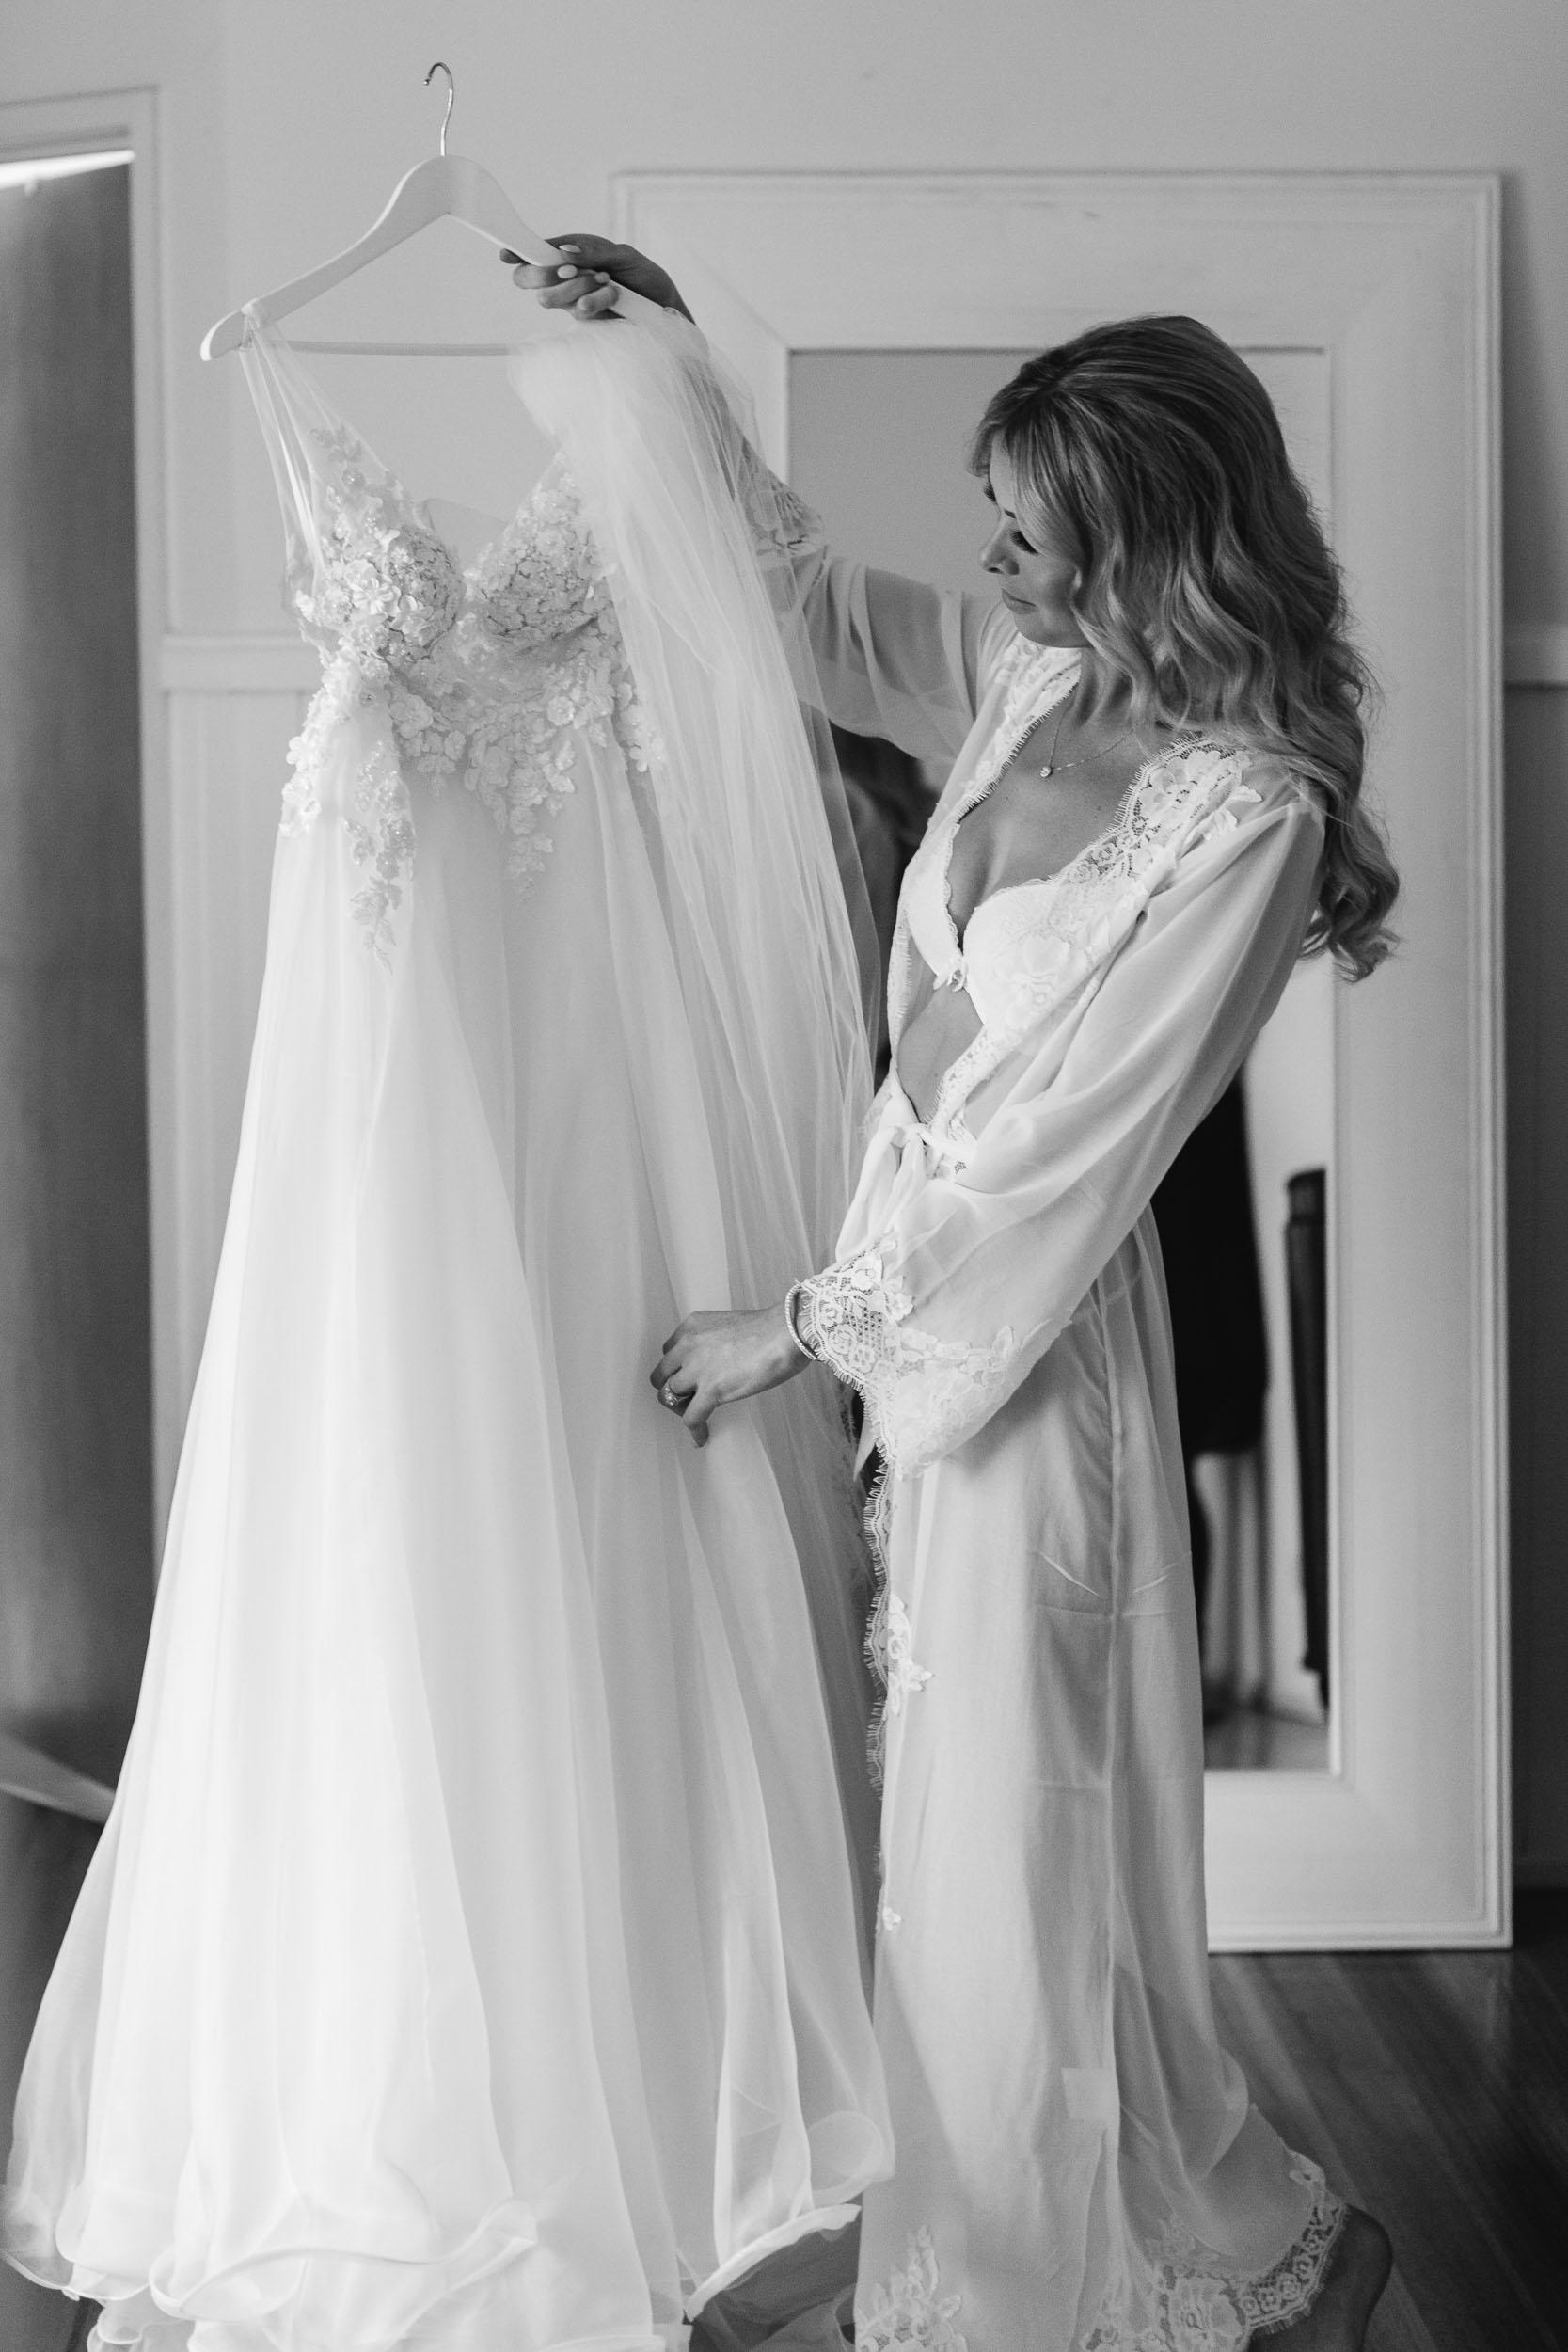 Kas-Richards-Mornington-Peninsula-Private-Property-Wedding-Marianna-Hardwick-Gown-71.jpg